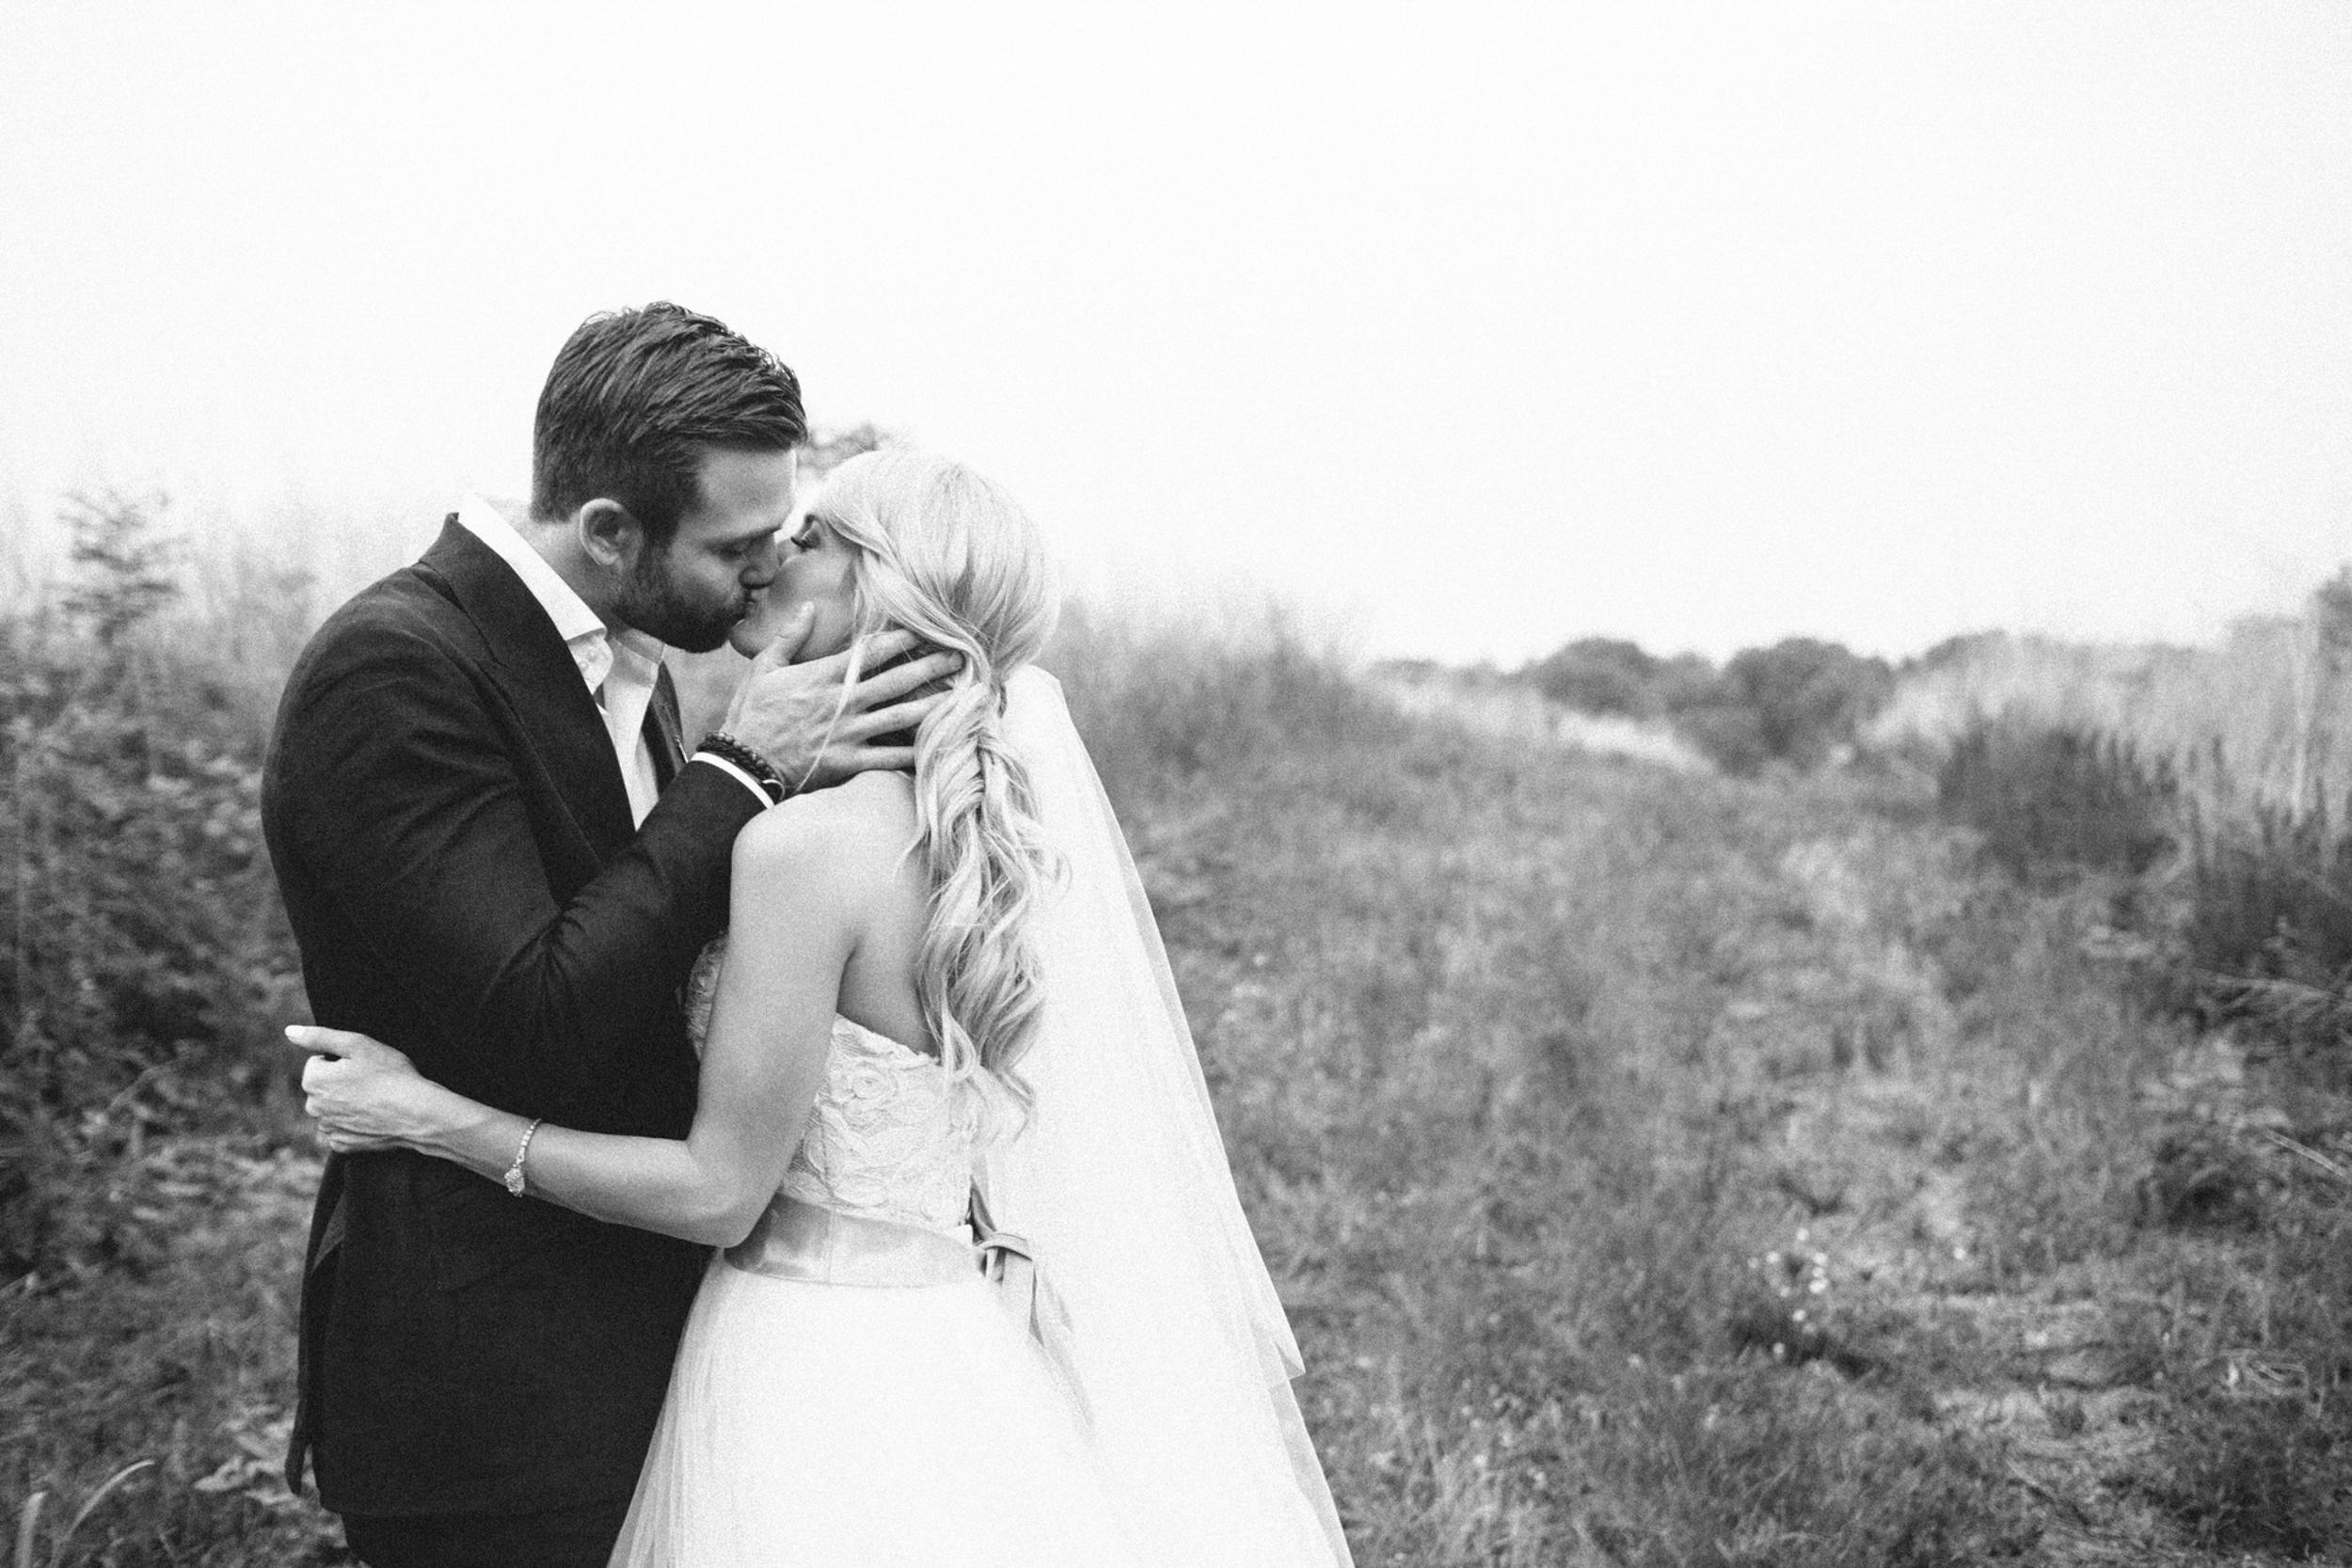 south_carolina_farm_wedding_rustic_chic_surprise_secret_luxe_wedding_bachelorette_emily_maynard_real_weddings-58.jpg